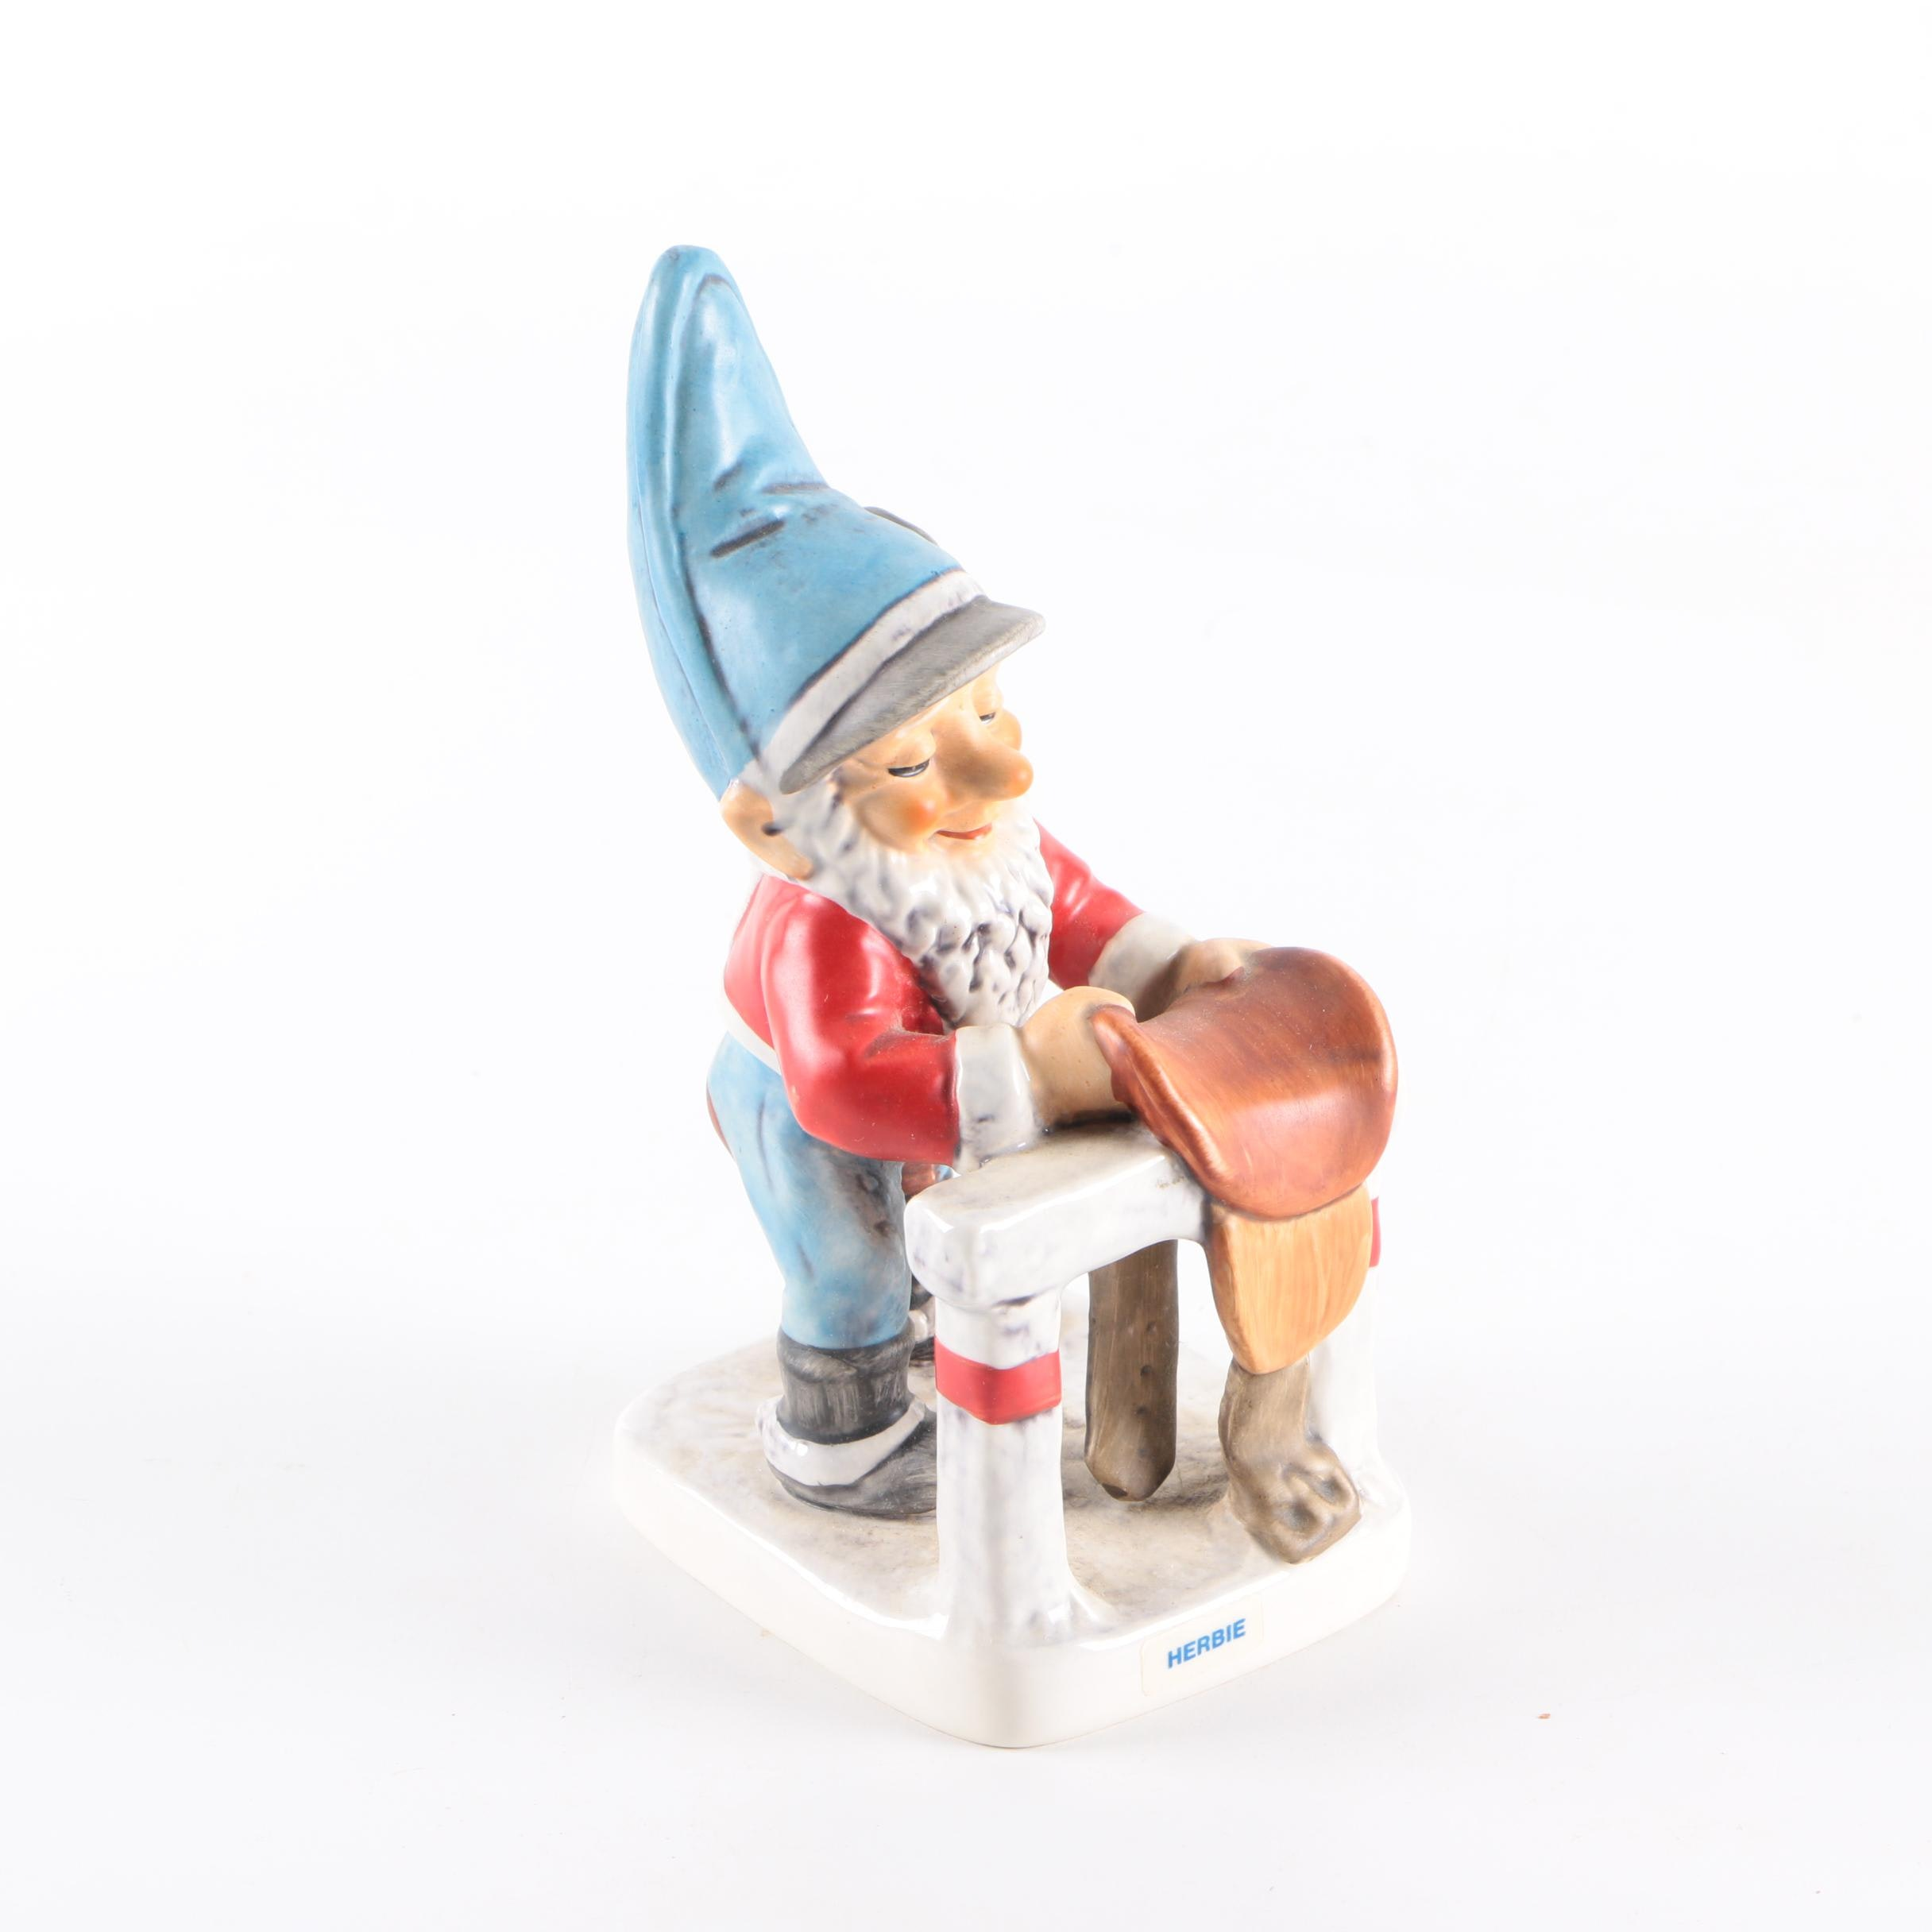 Goebel Co-Boy Herbie the Horseman Figurine